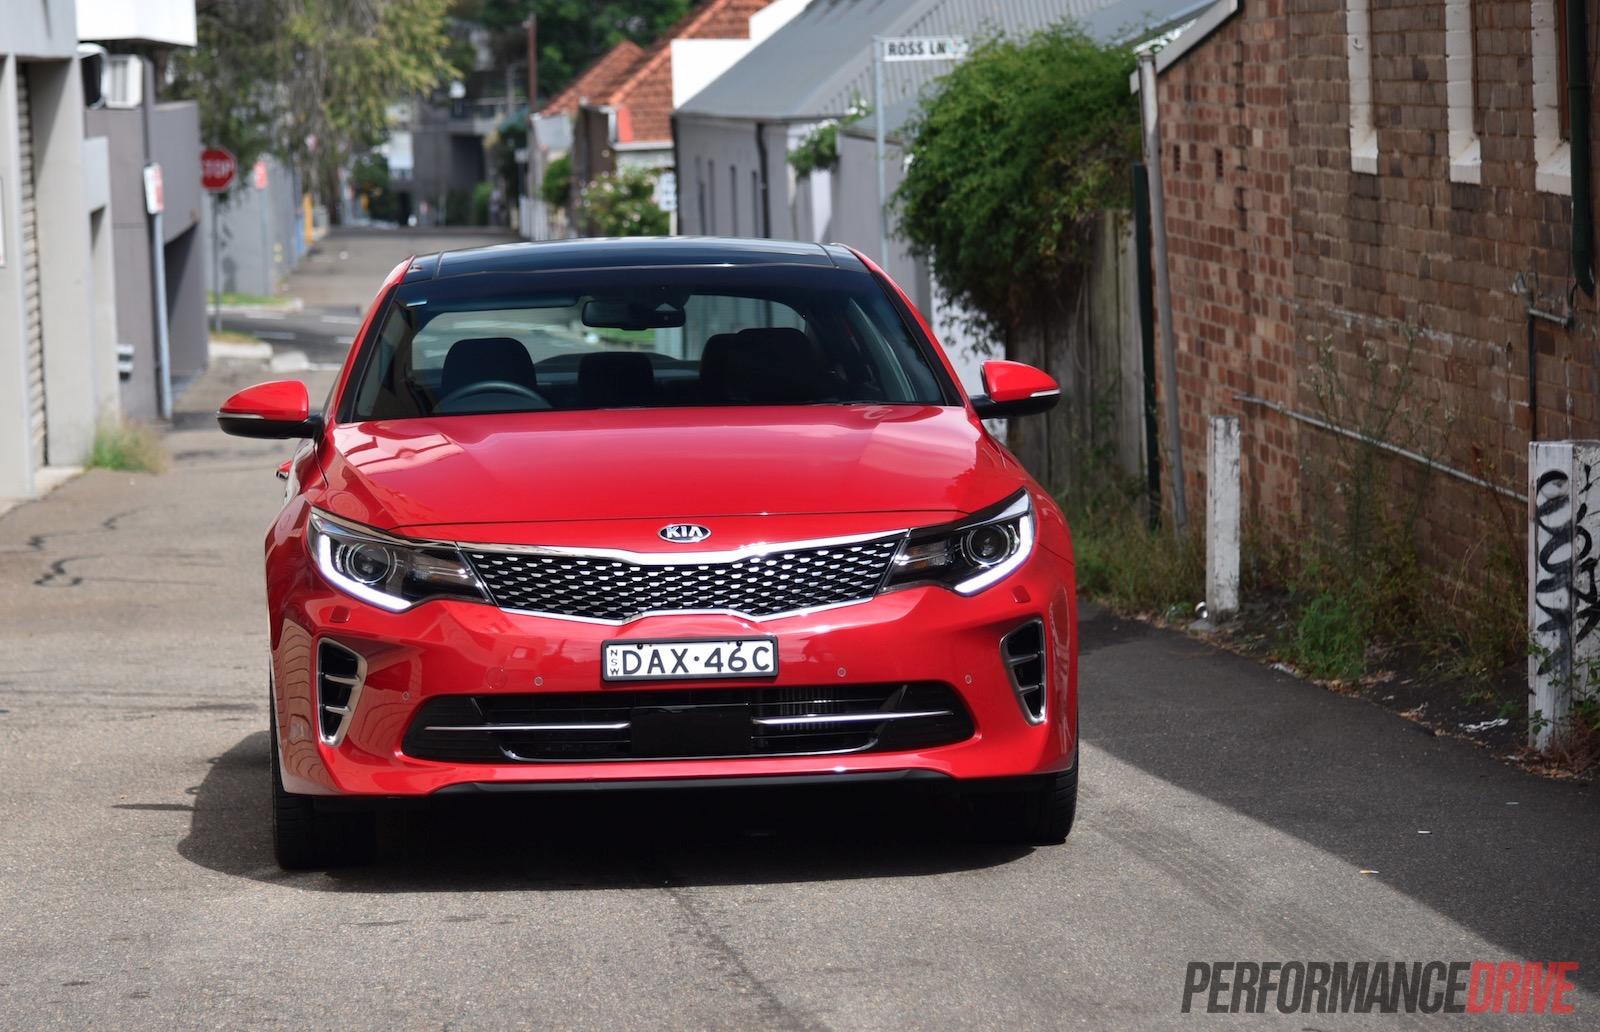 2016 Kia Optima Gt Turbo Review Video Performancedrive Modified Healights